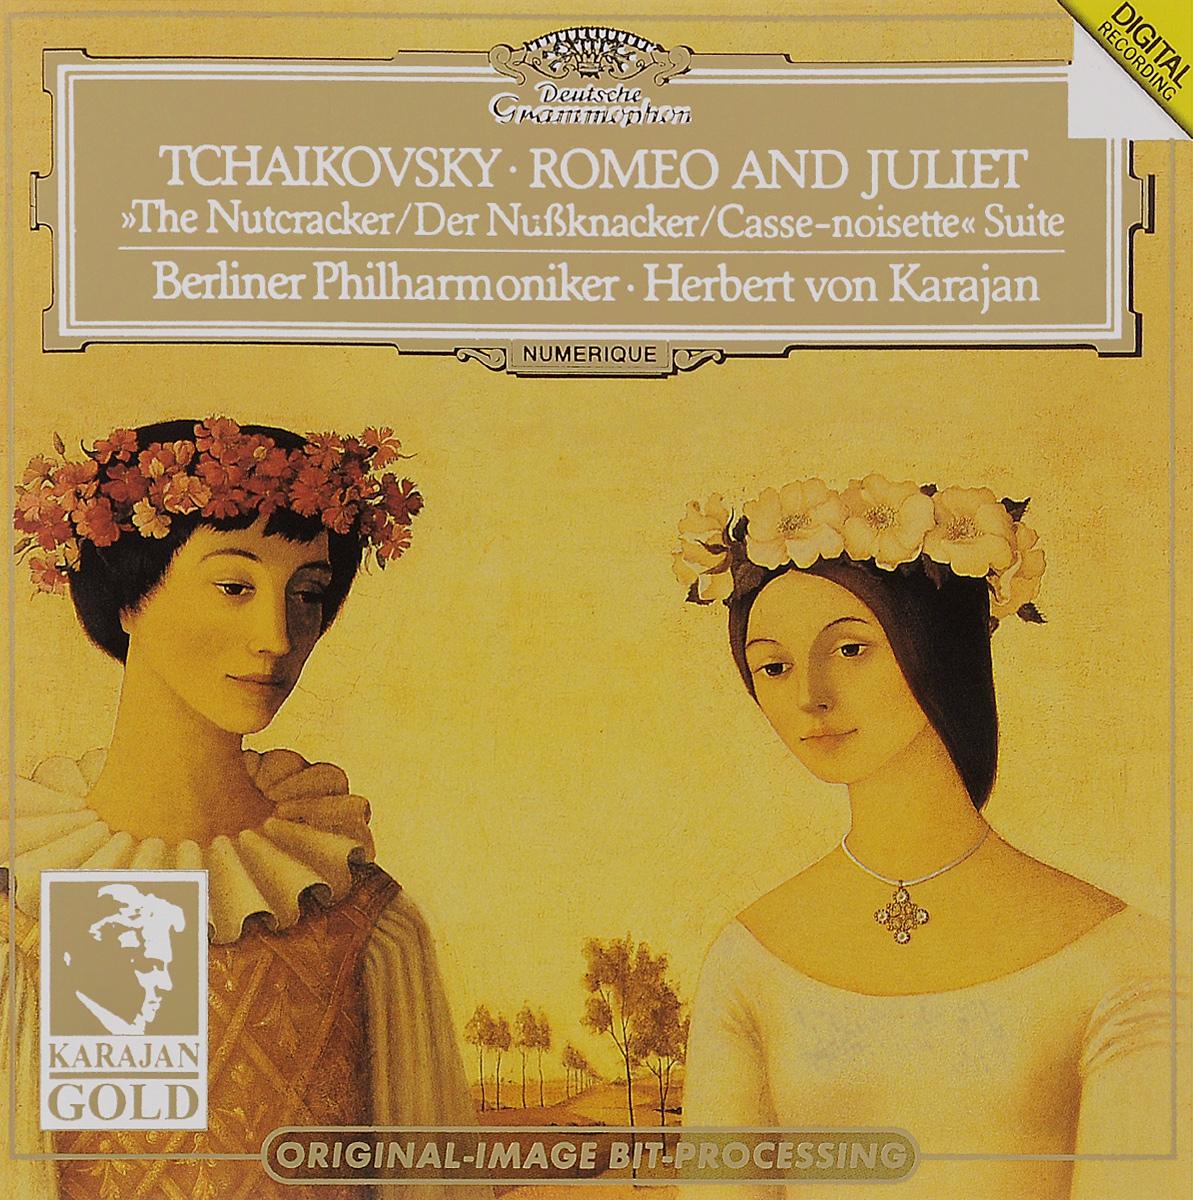 Герберт Караян,Berliner Philharmoniker Herbert Von Karajan. Tchaikovsky. Romeo And Juliet / The Nutcracker стоимость